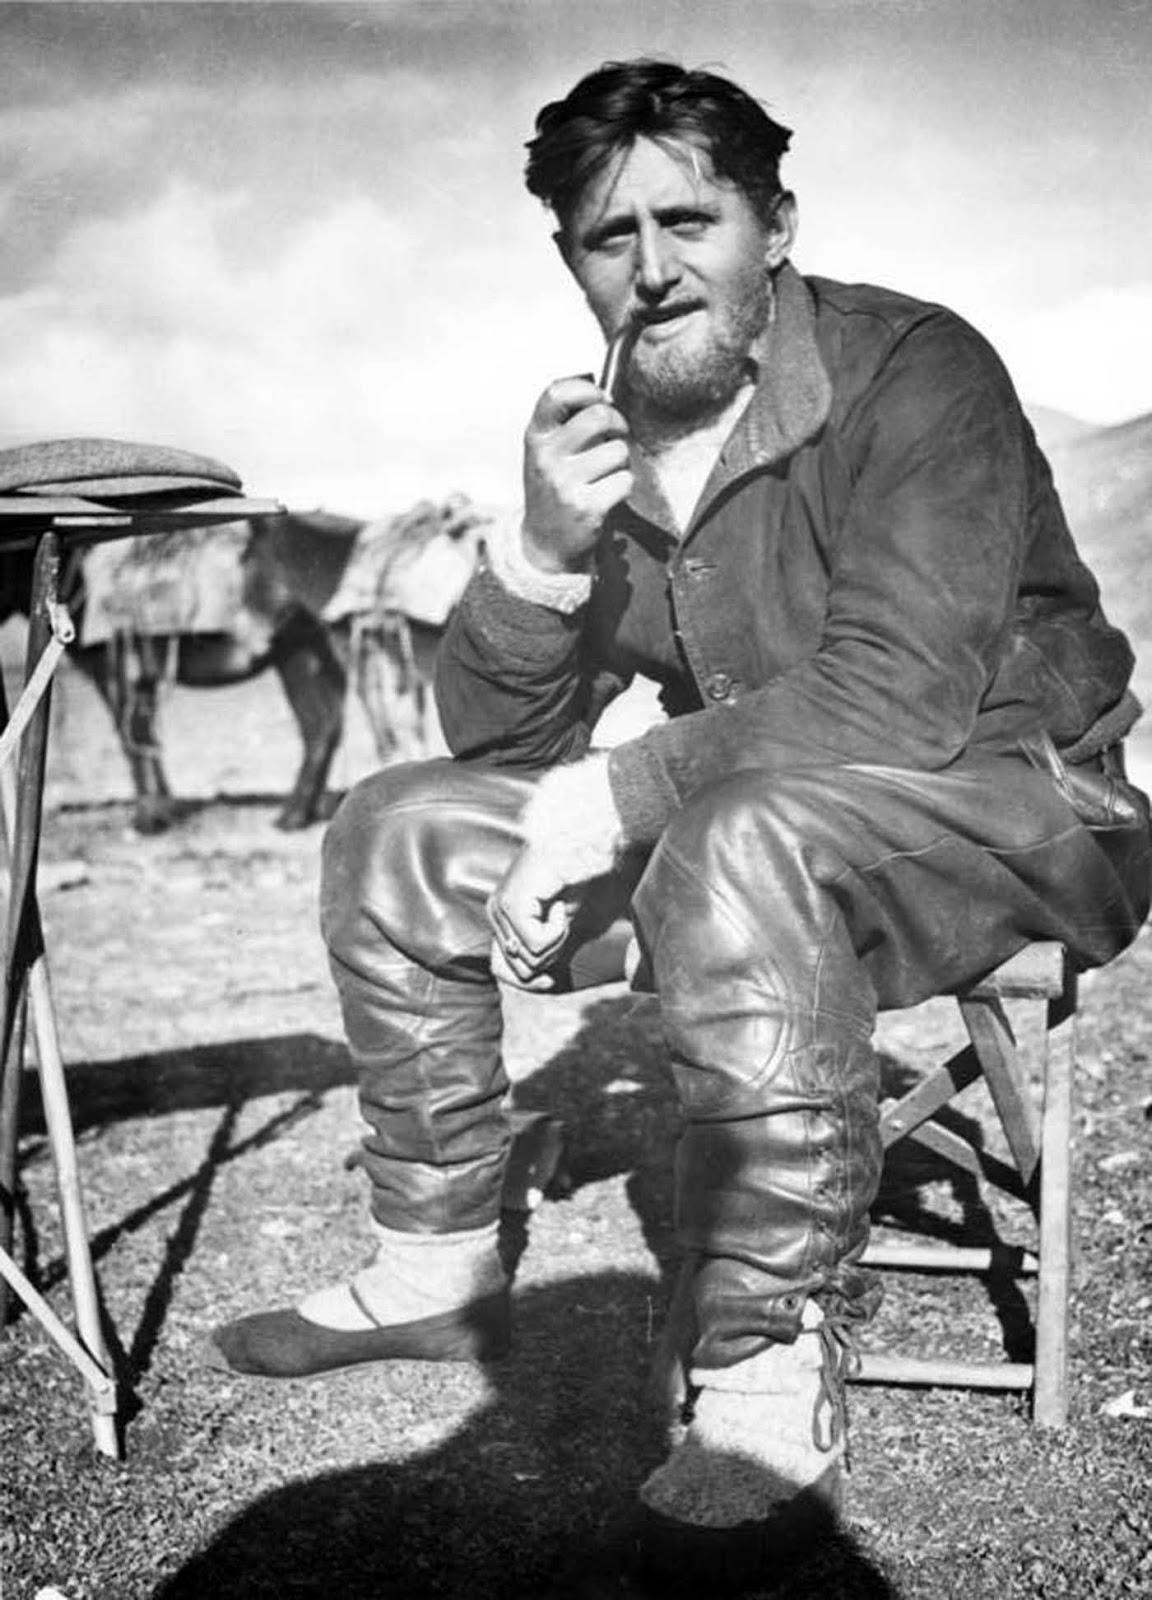 Edmund Geer en el Tíbet, 1938.